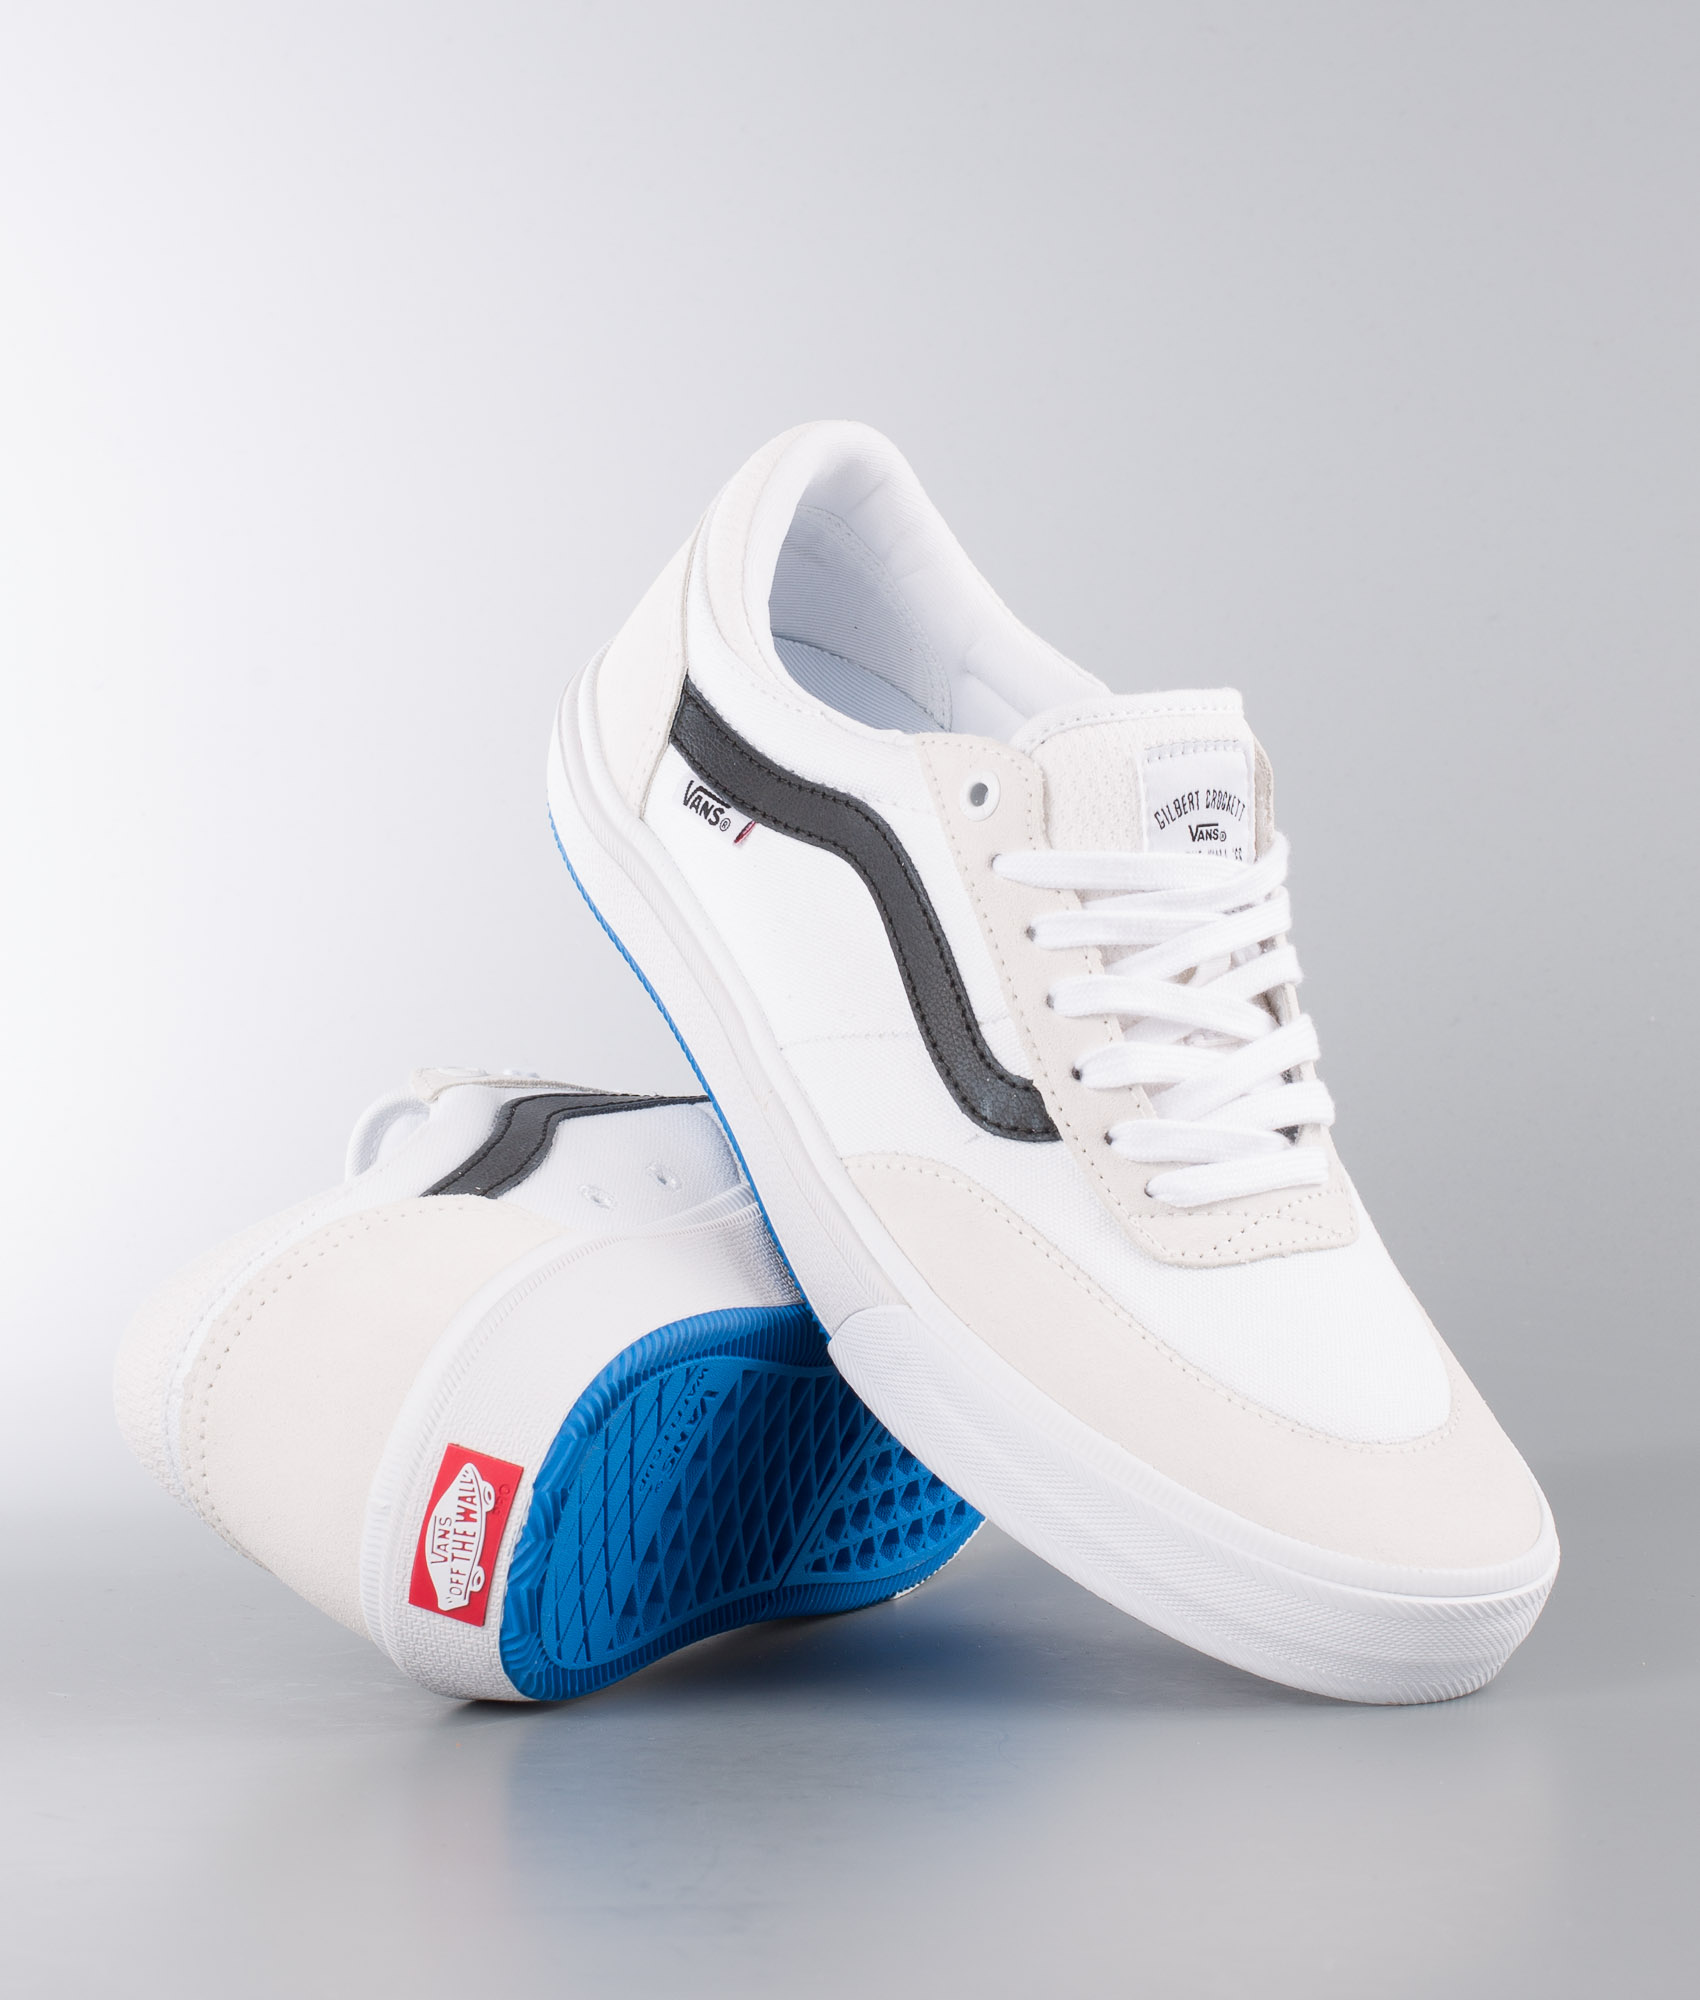 Vans Gilbert Crockett 2 Pro Shoes True White/Black - Ridestore.com